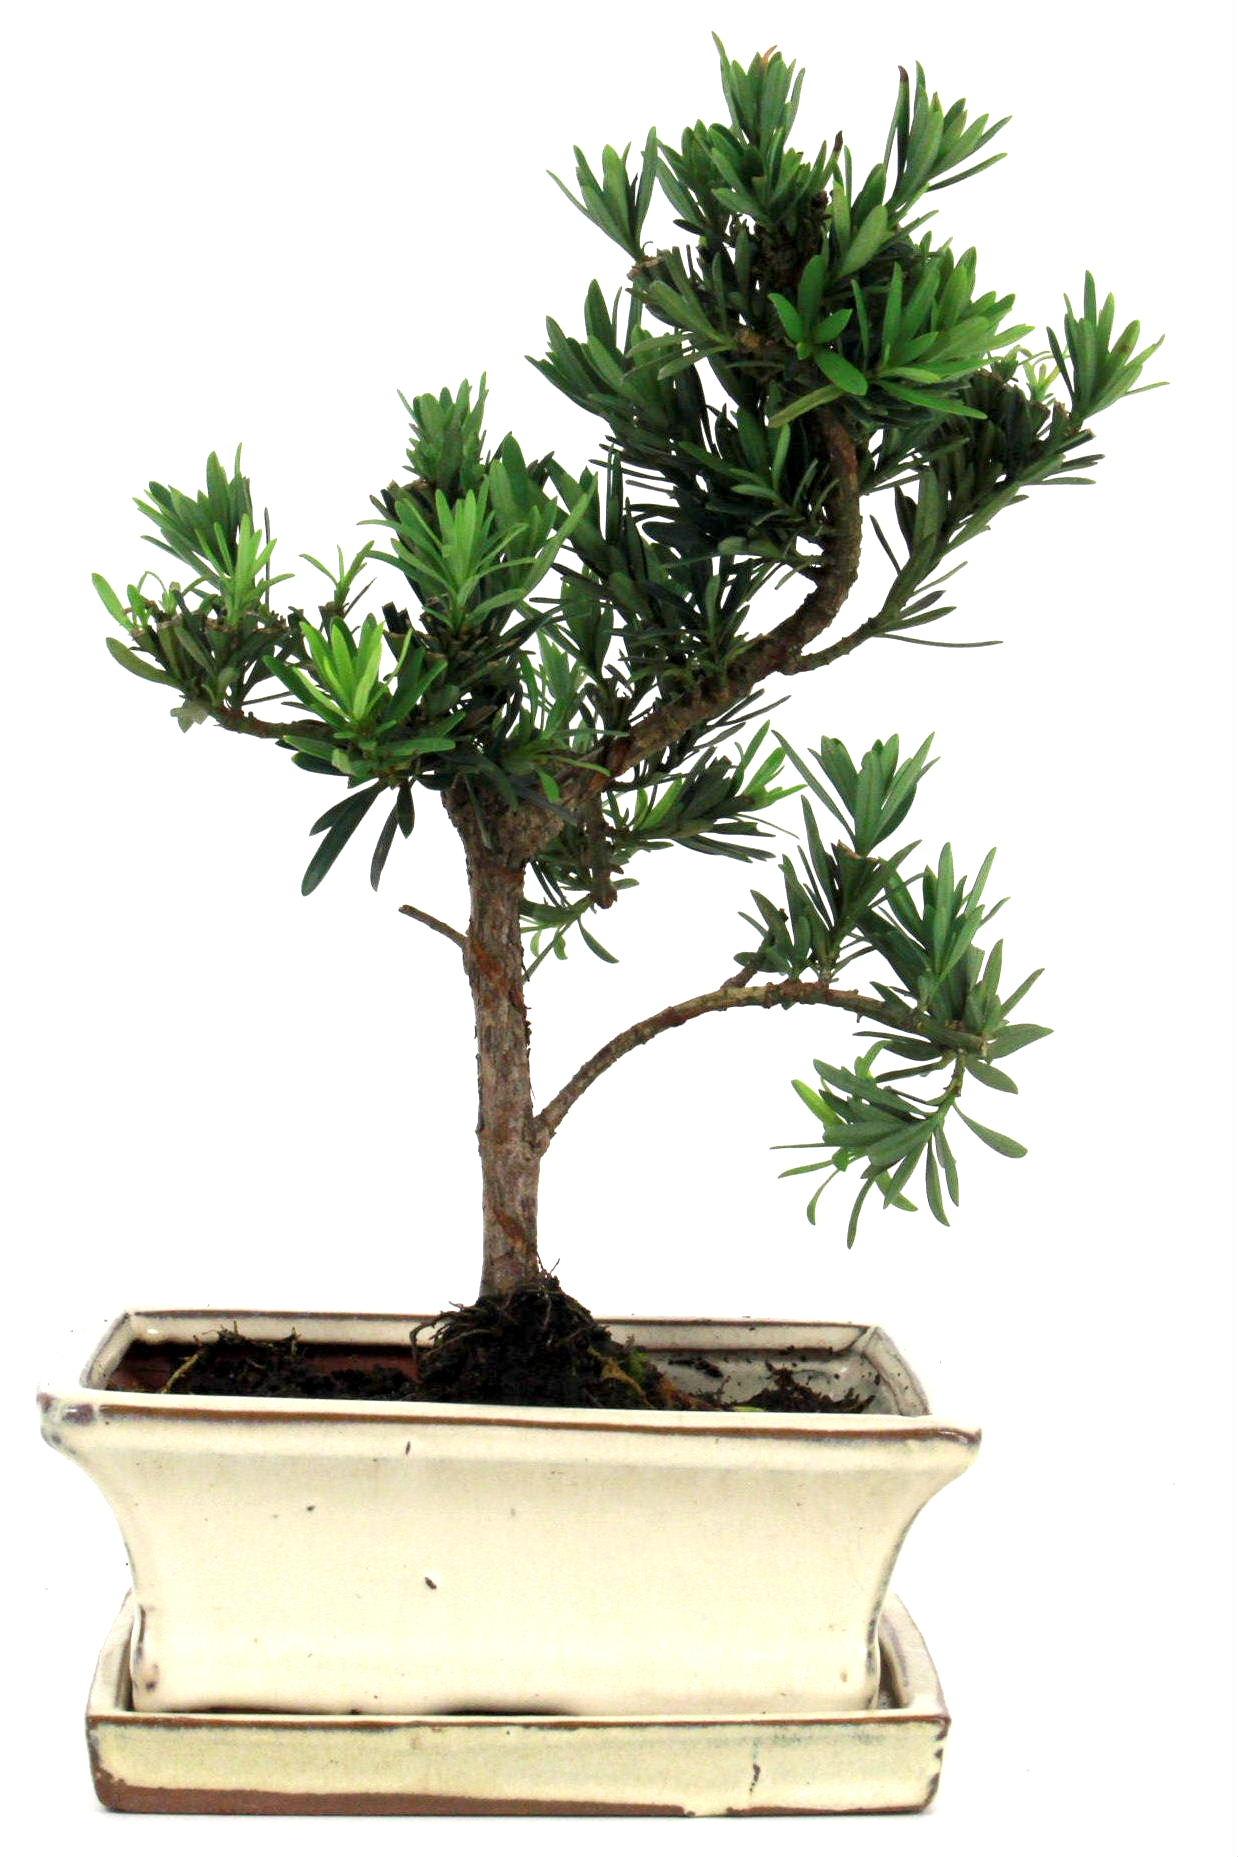 steineibe bonsai 30 35 cm 1635 bei oyaki bonsai kaufen. Black Bedroom Furniture Sets. Home Design Ideas